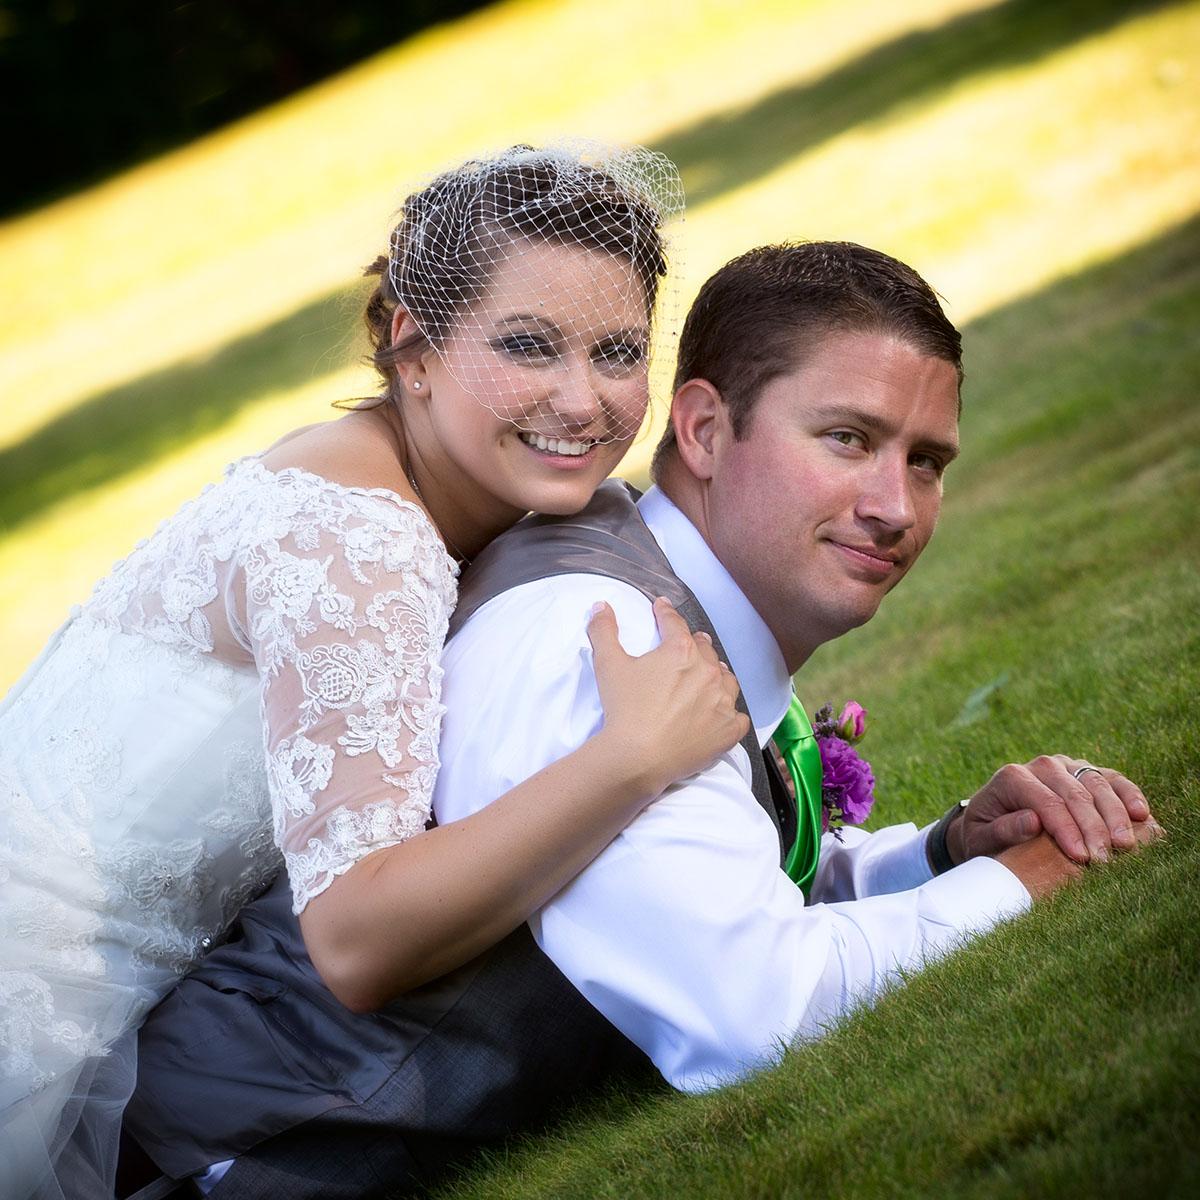 Dunegrass Golf Club Wedding of Sabrina and Bill